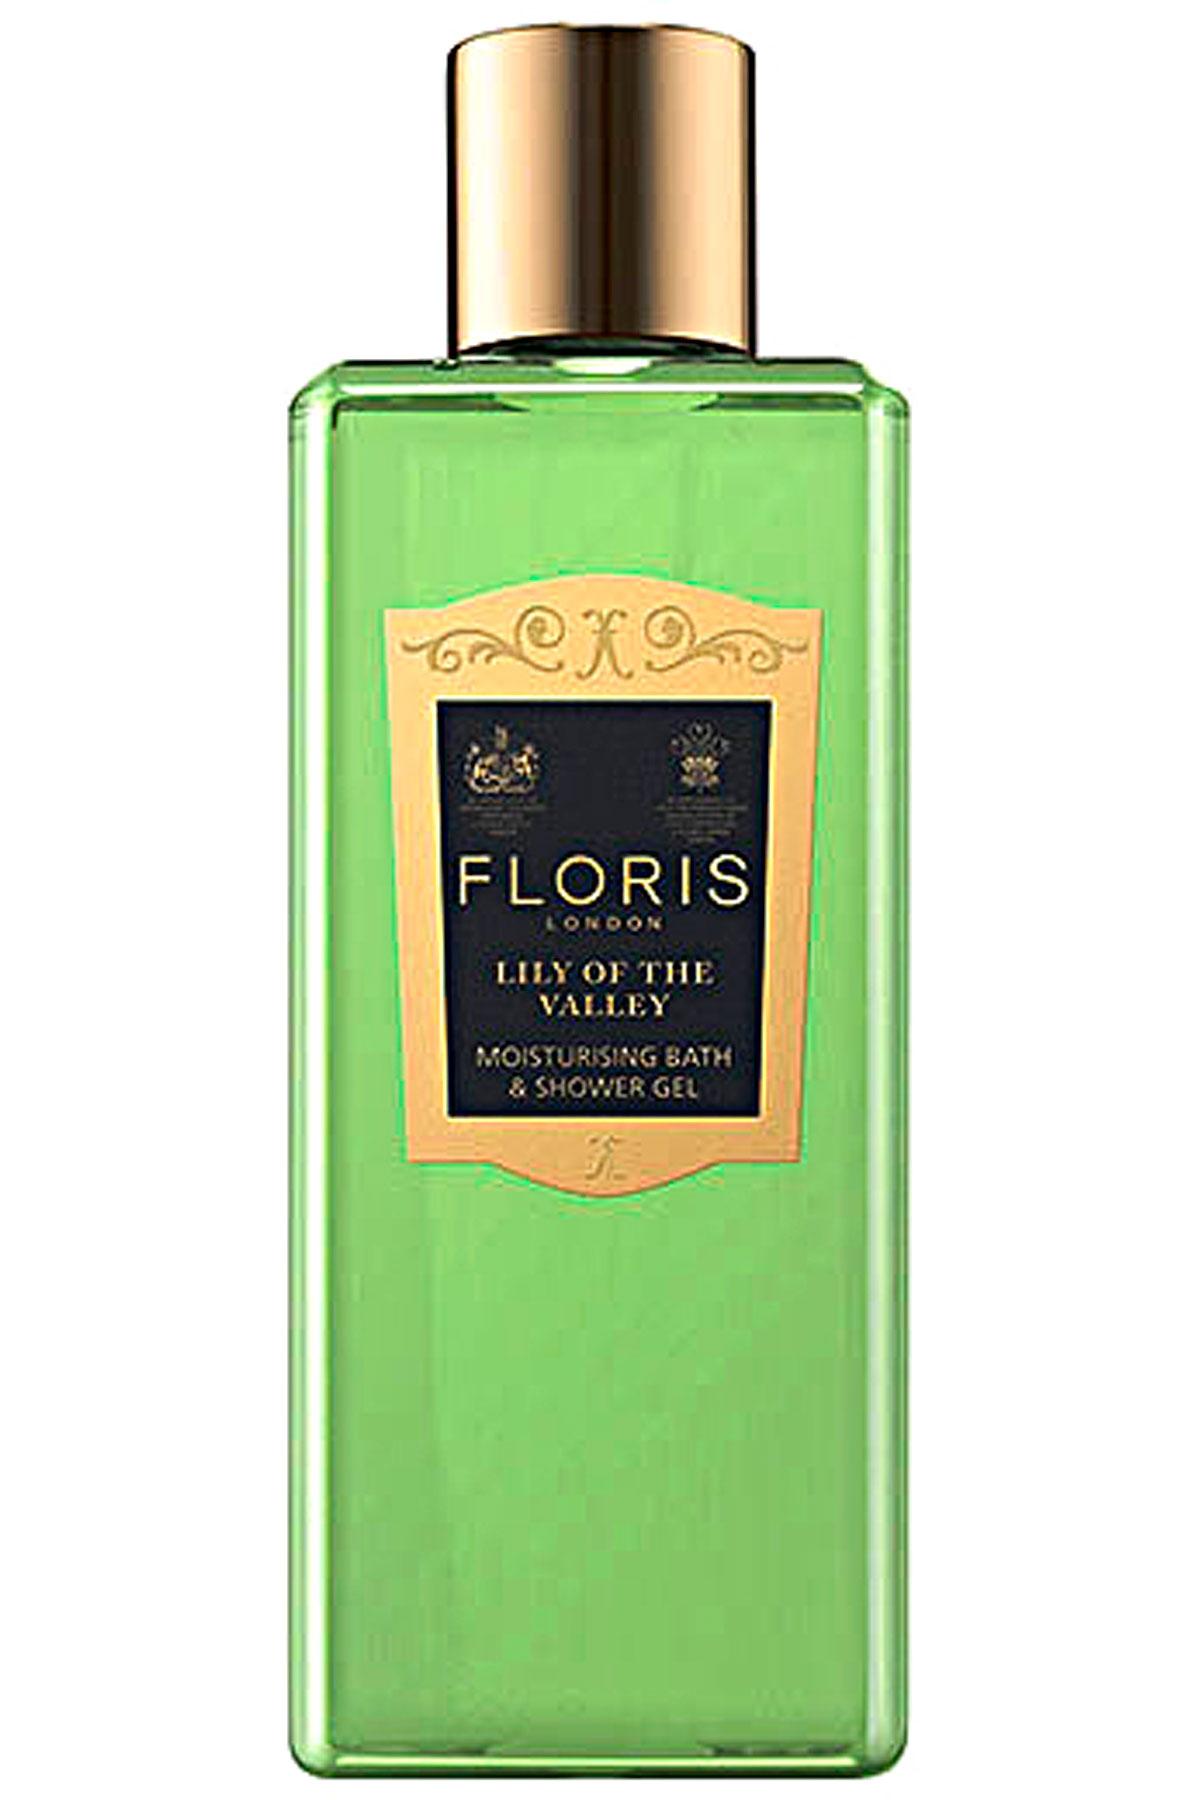 Floris London Beauty for Women On Sale, Lily Of The Valley - Bath & Shower Gel - 250 Ml, 2019, 250 ml